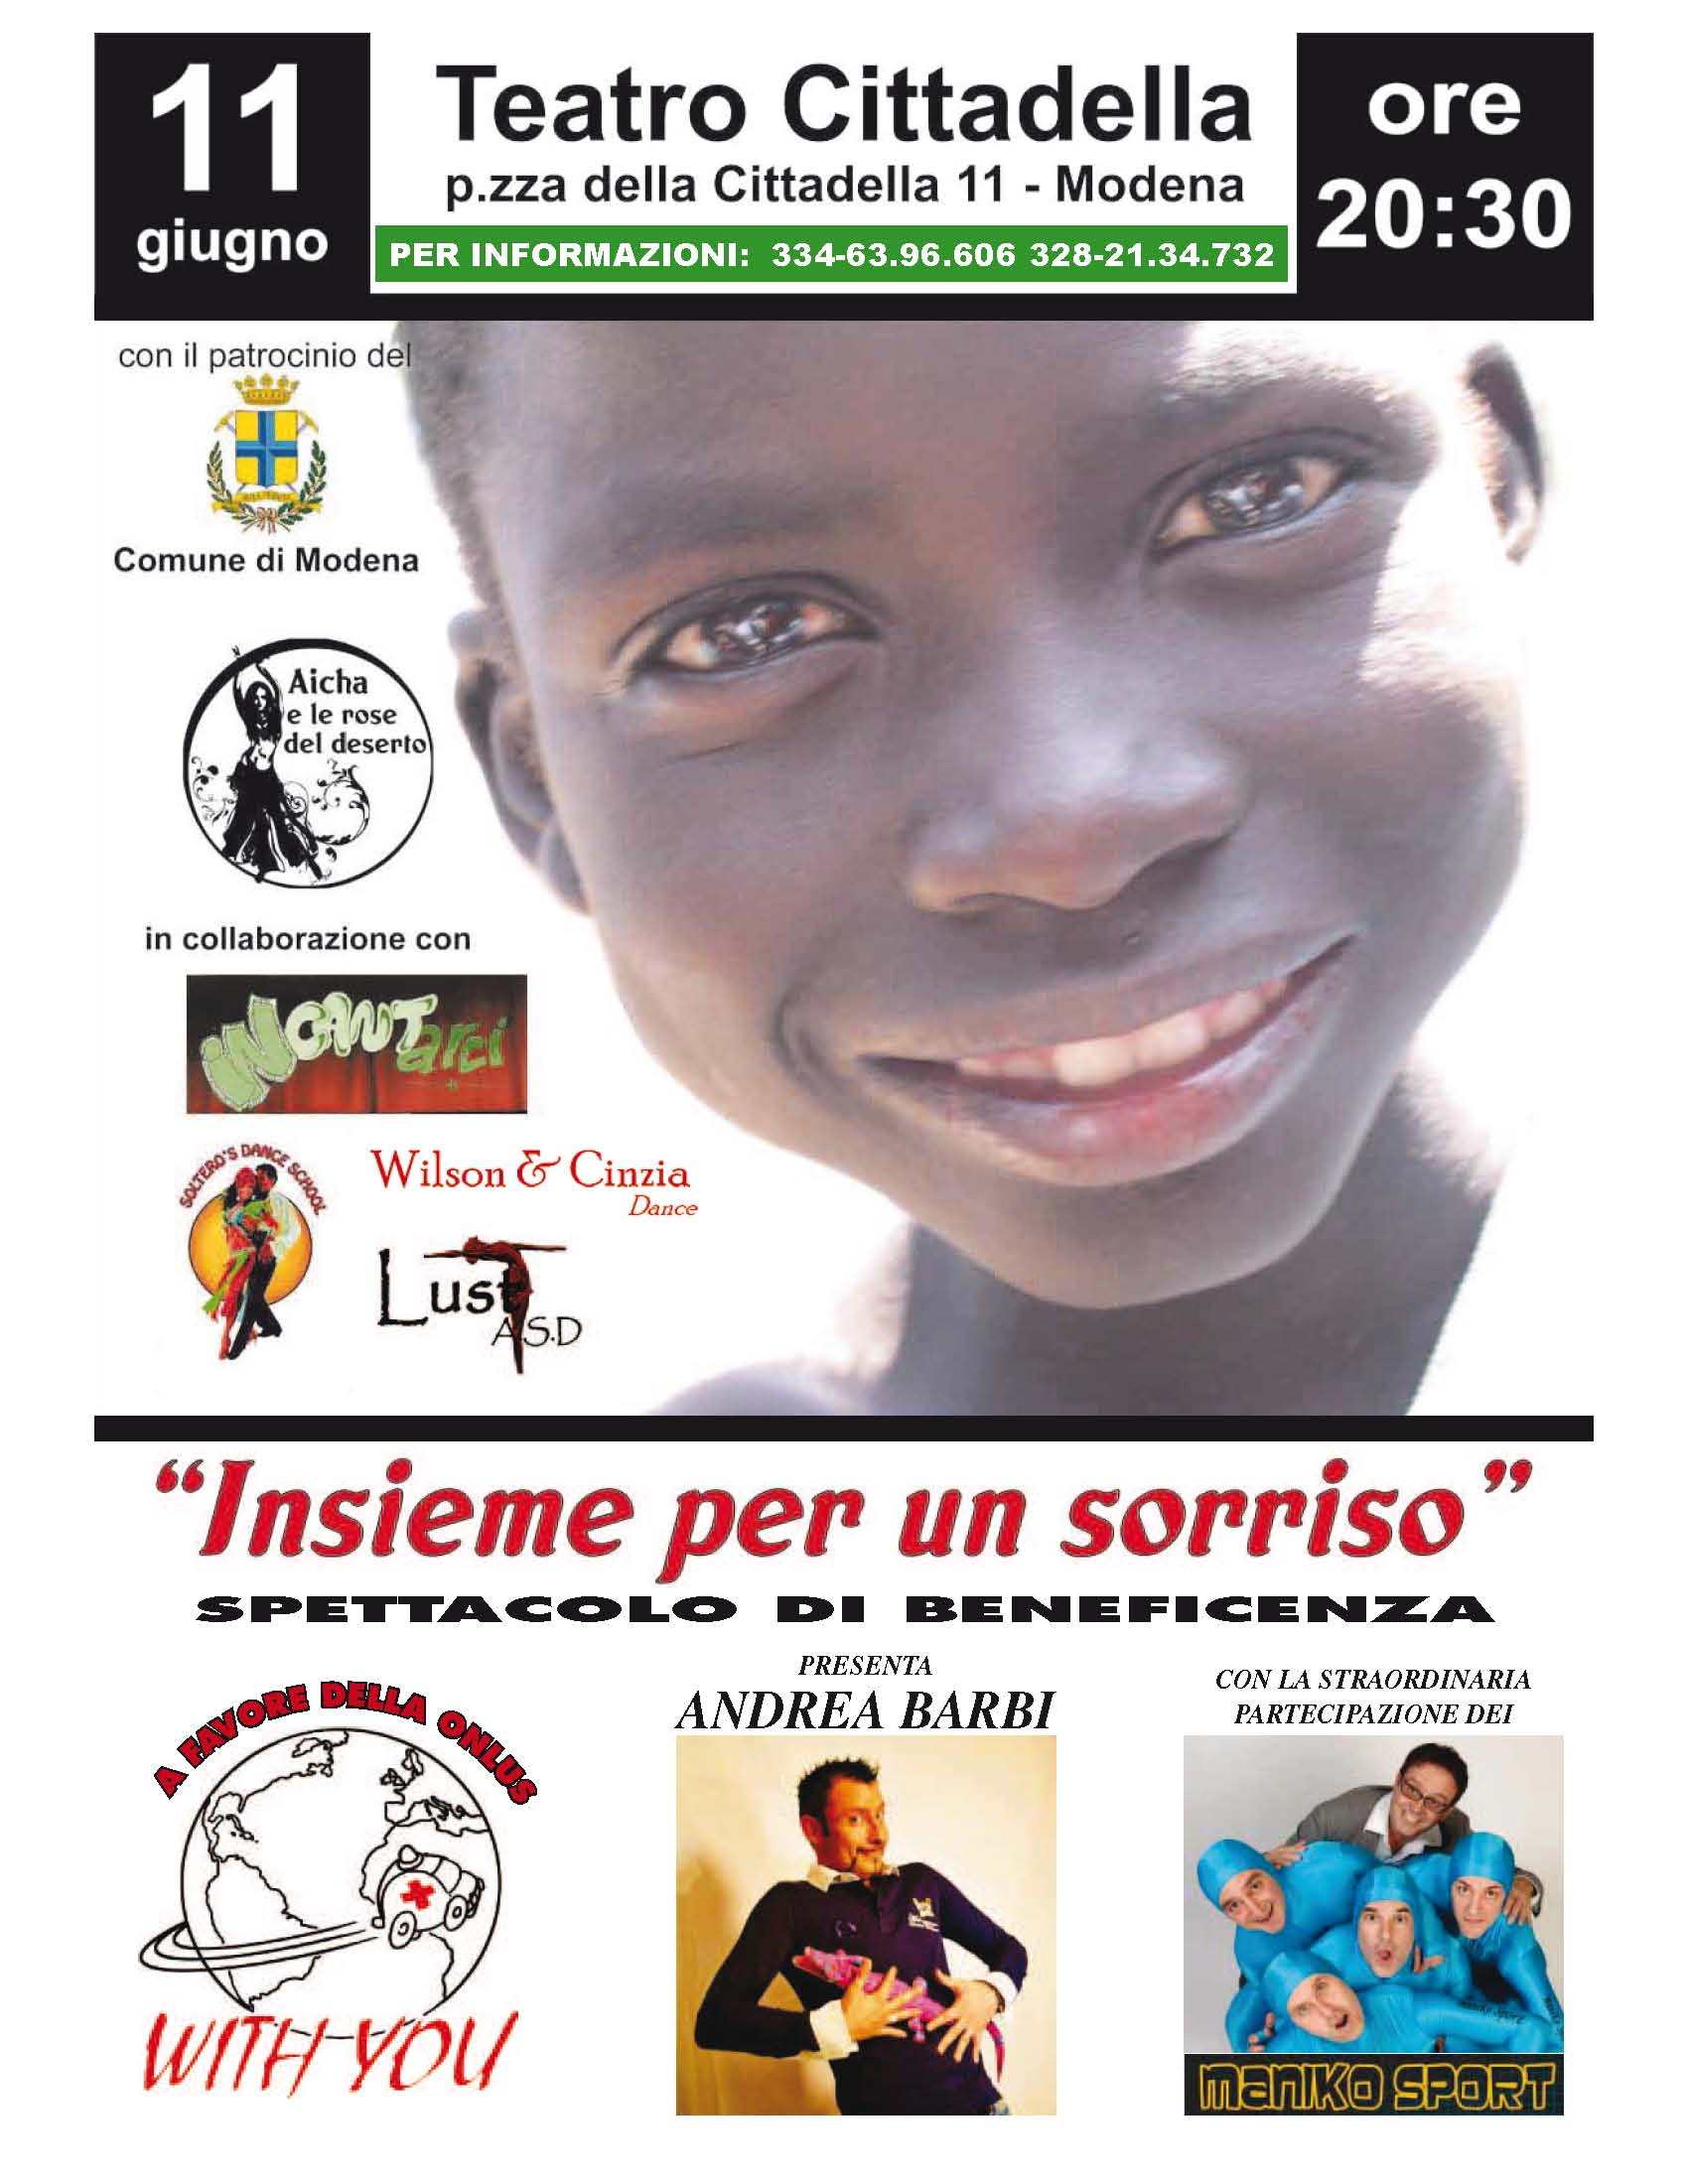 Insieme_per_un_sorriso-11.06.2011